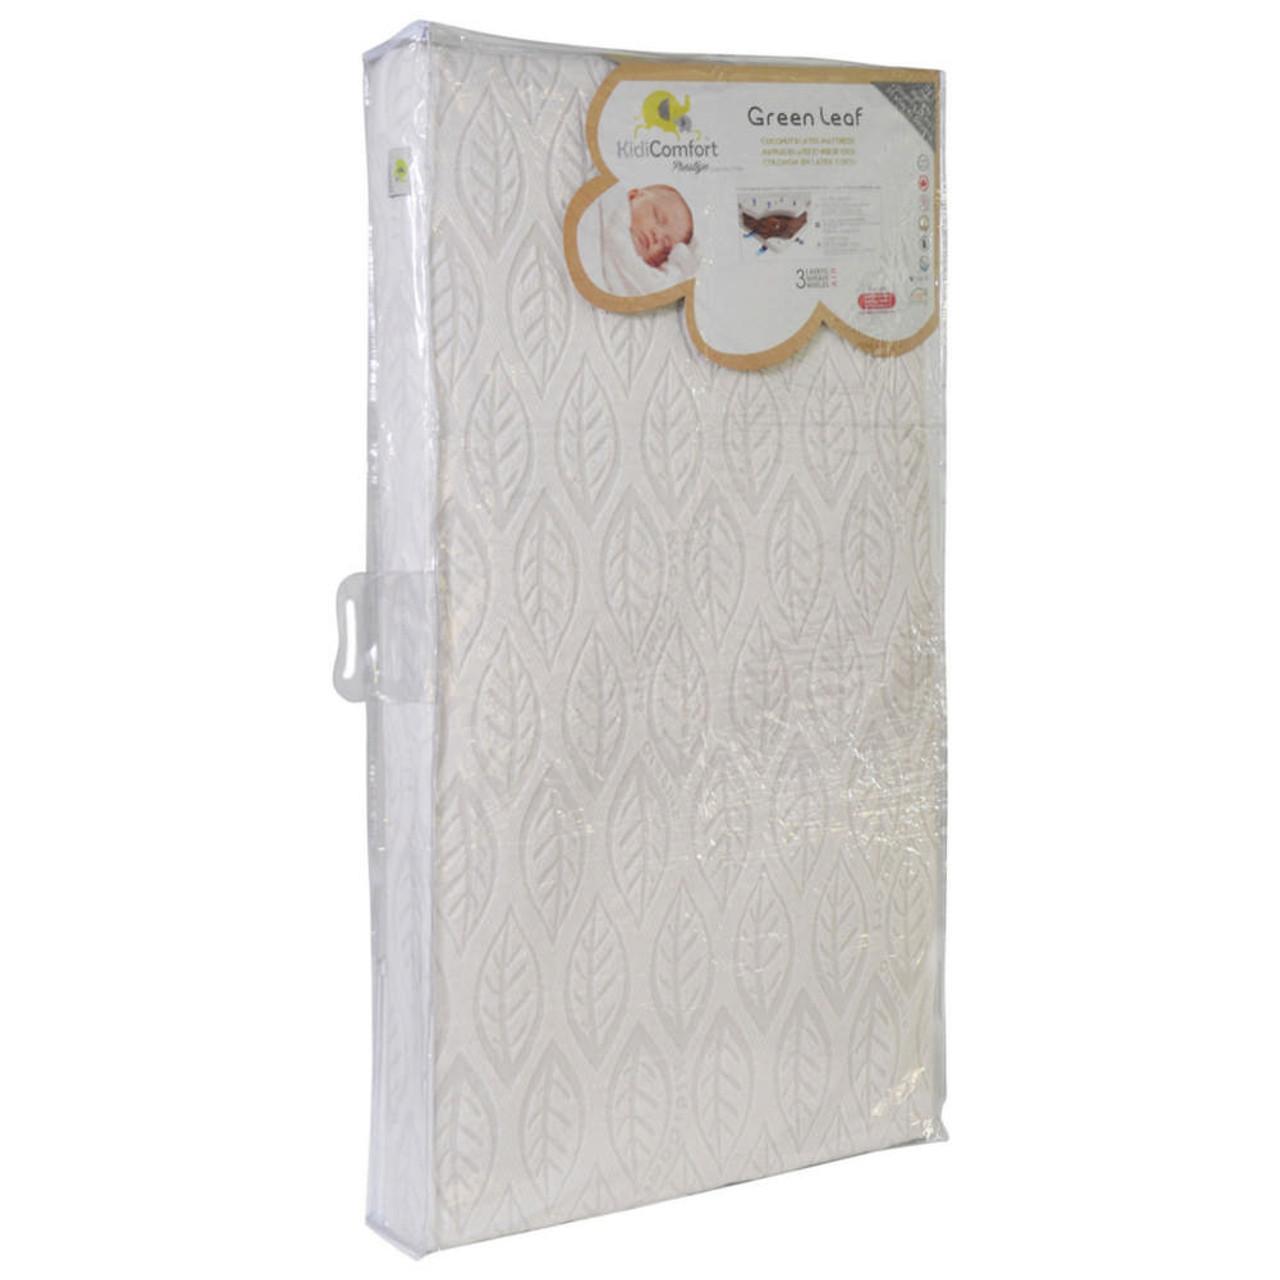 Kidicomfort Green Leaf 2 In 1 Crib Mattress Dear Born Baby